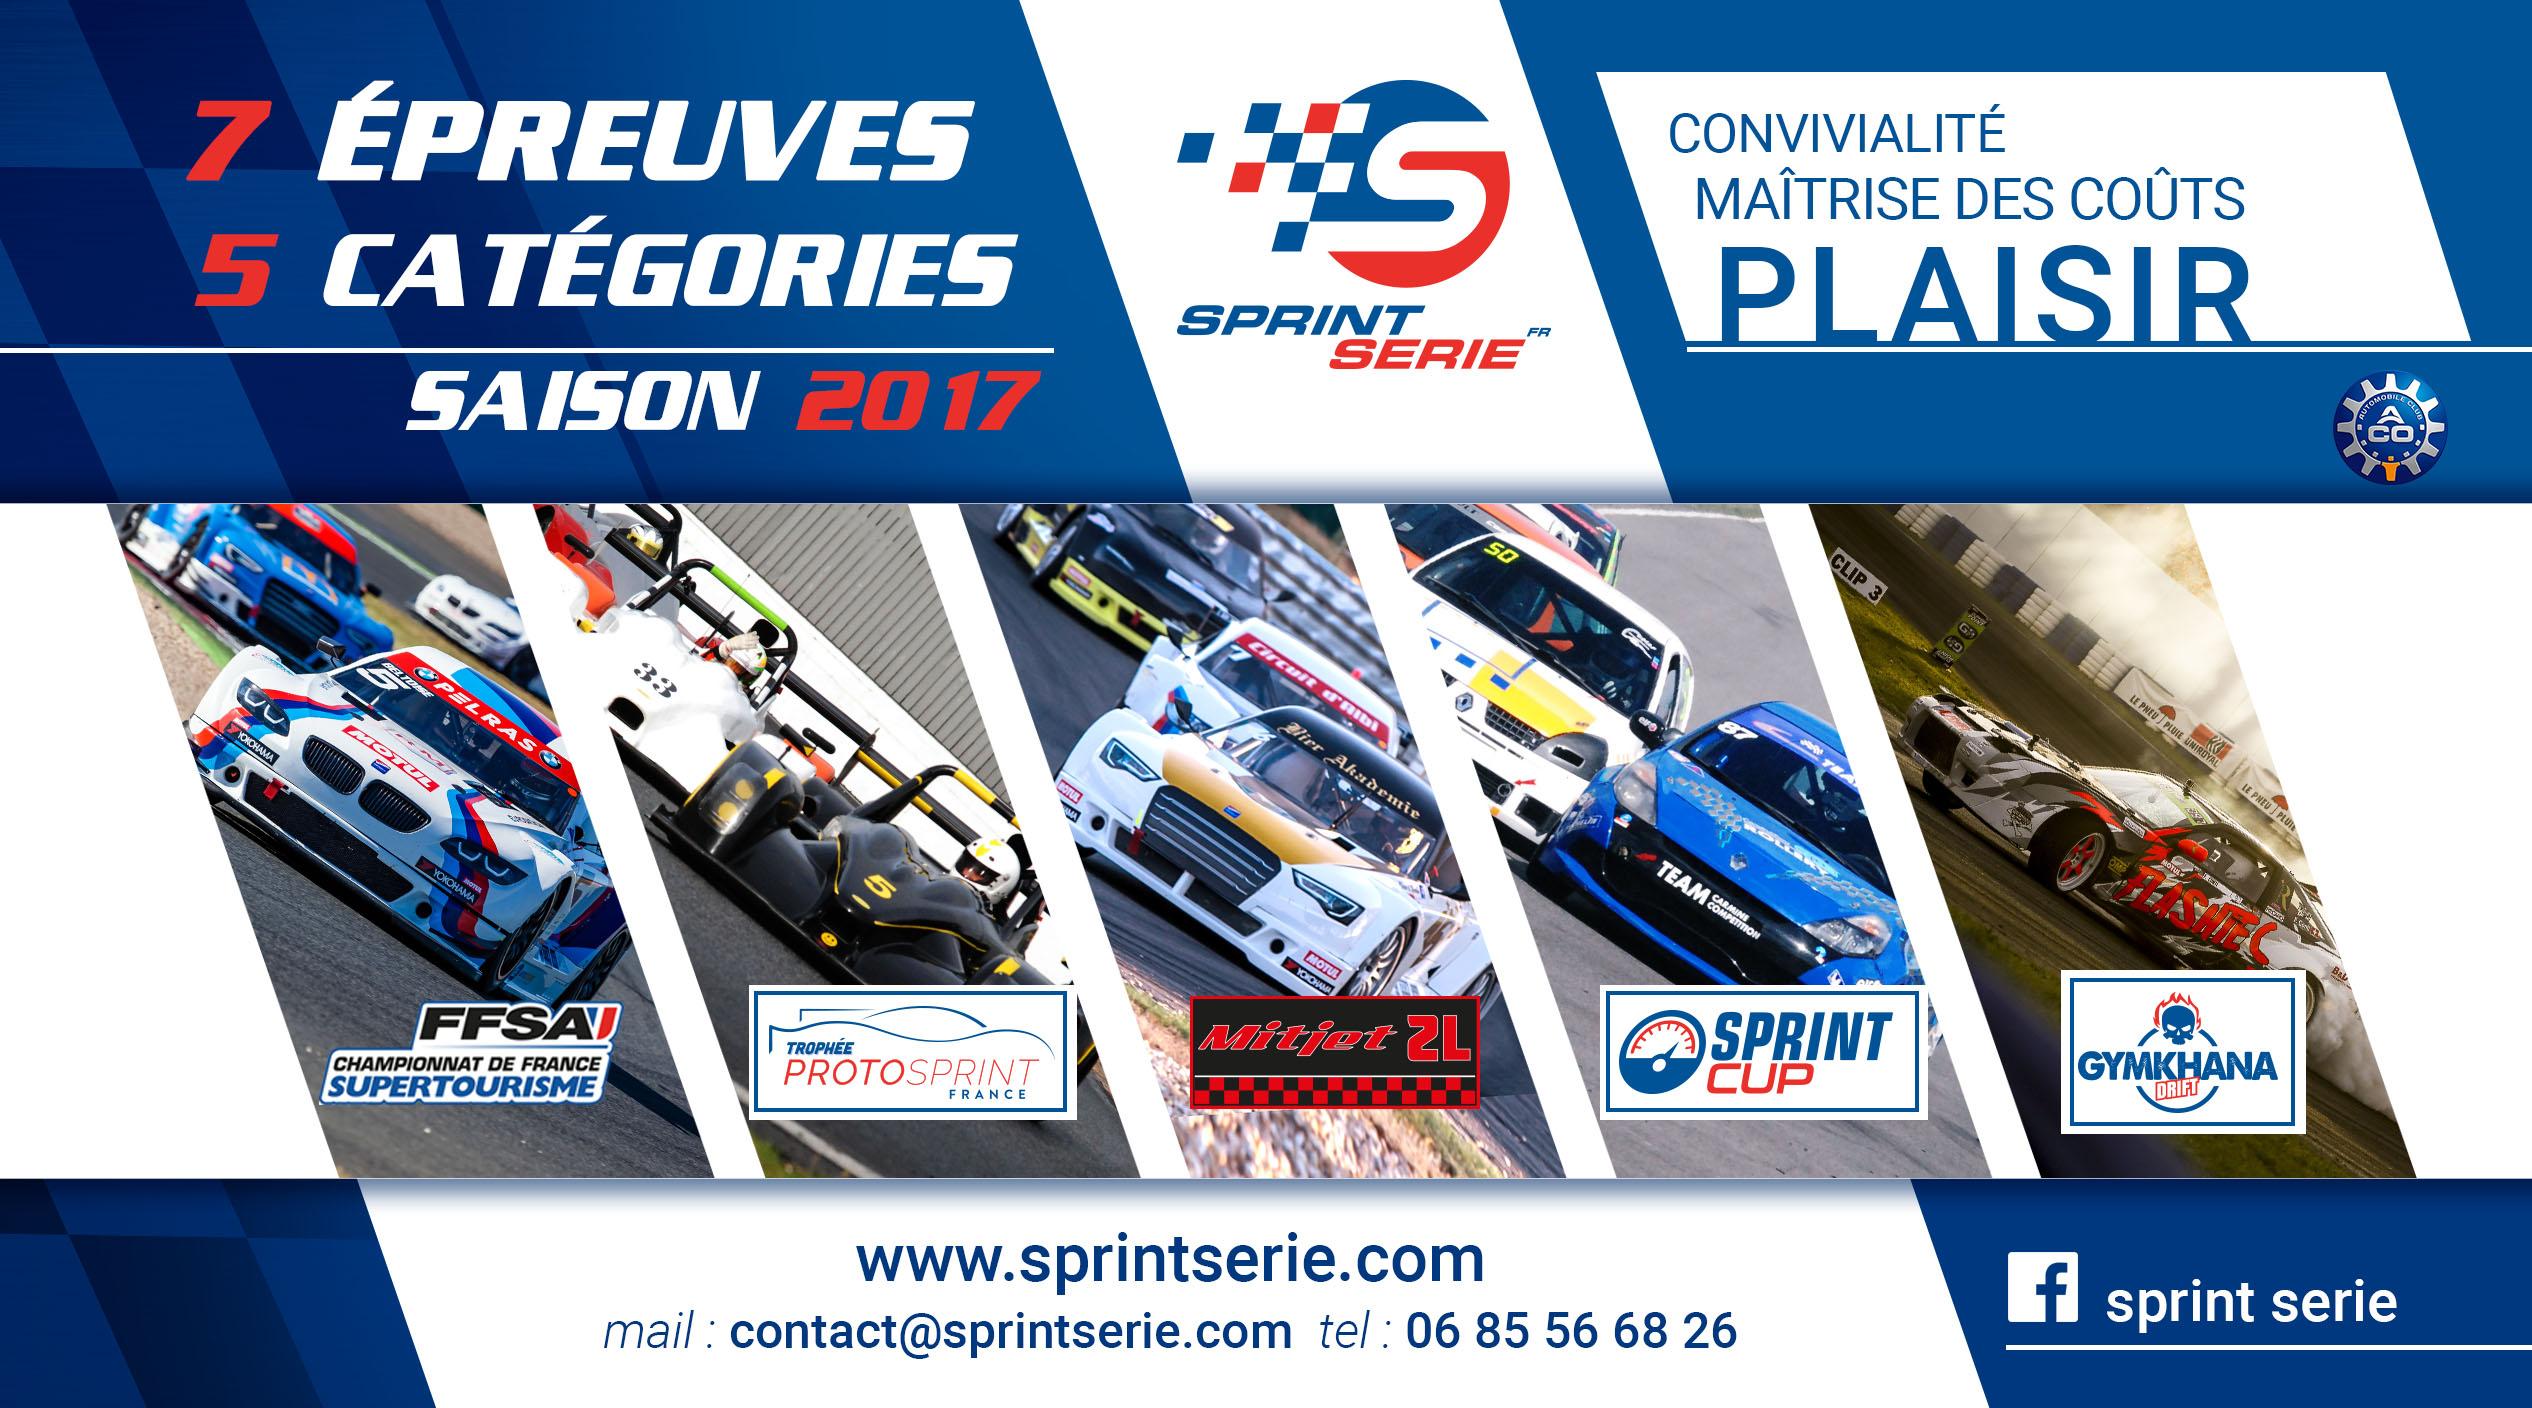 Sprint Serie